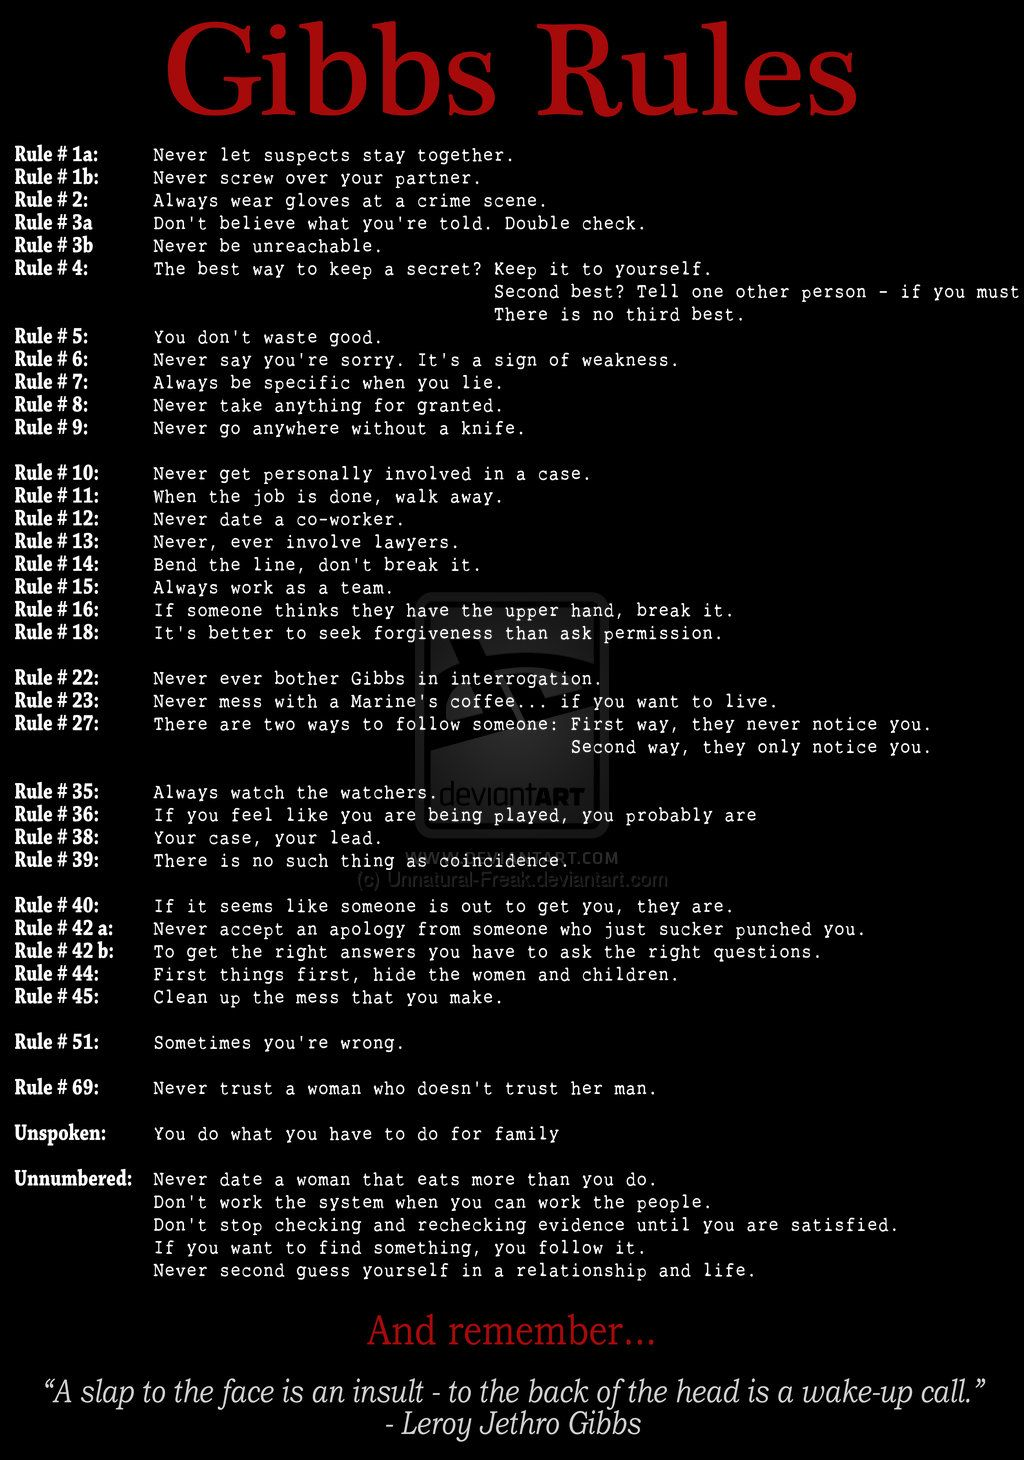 Légend image with regard to ncis gibbs rules printable list